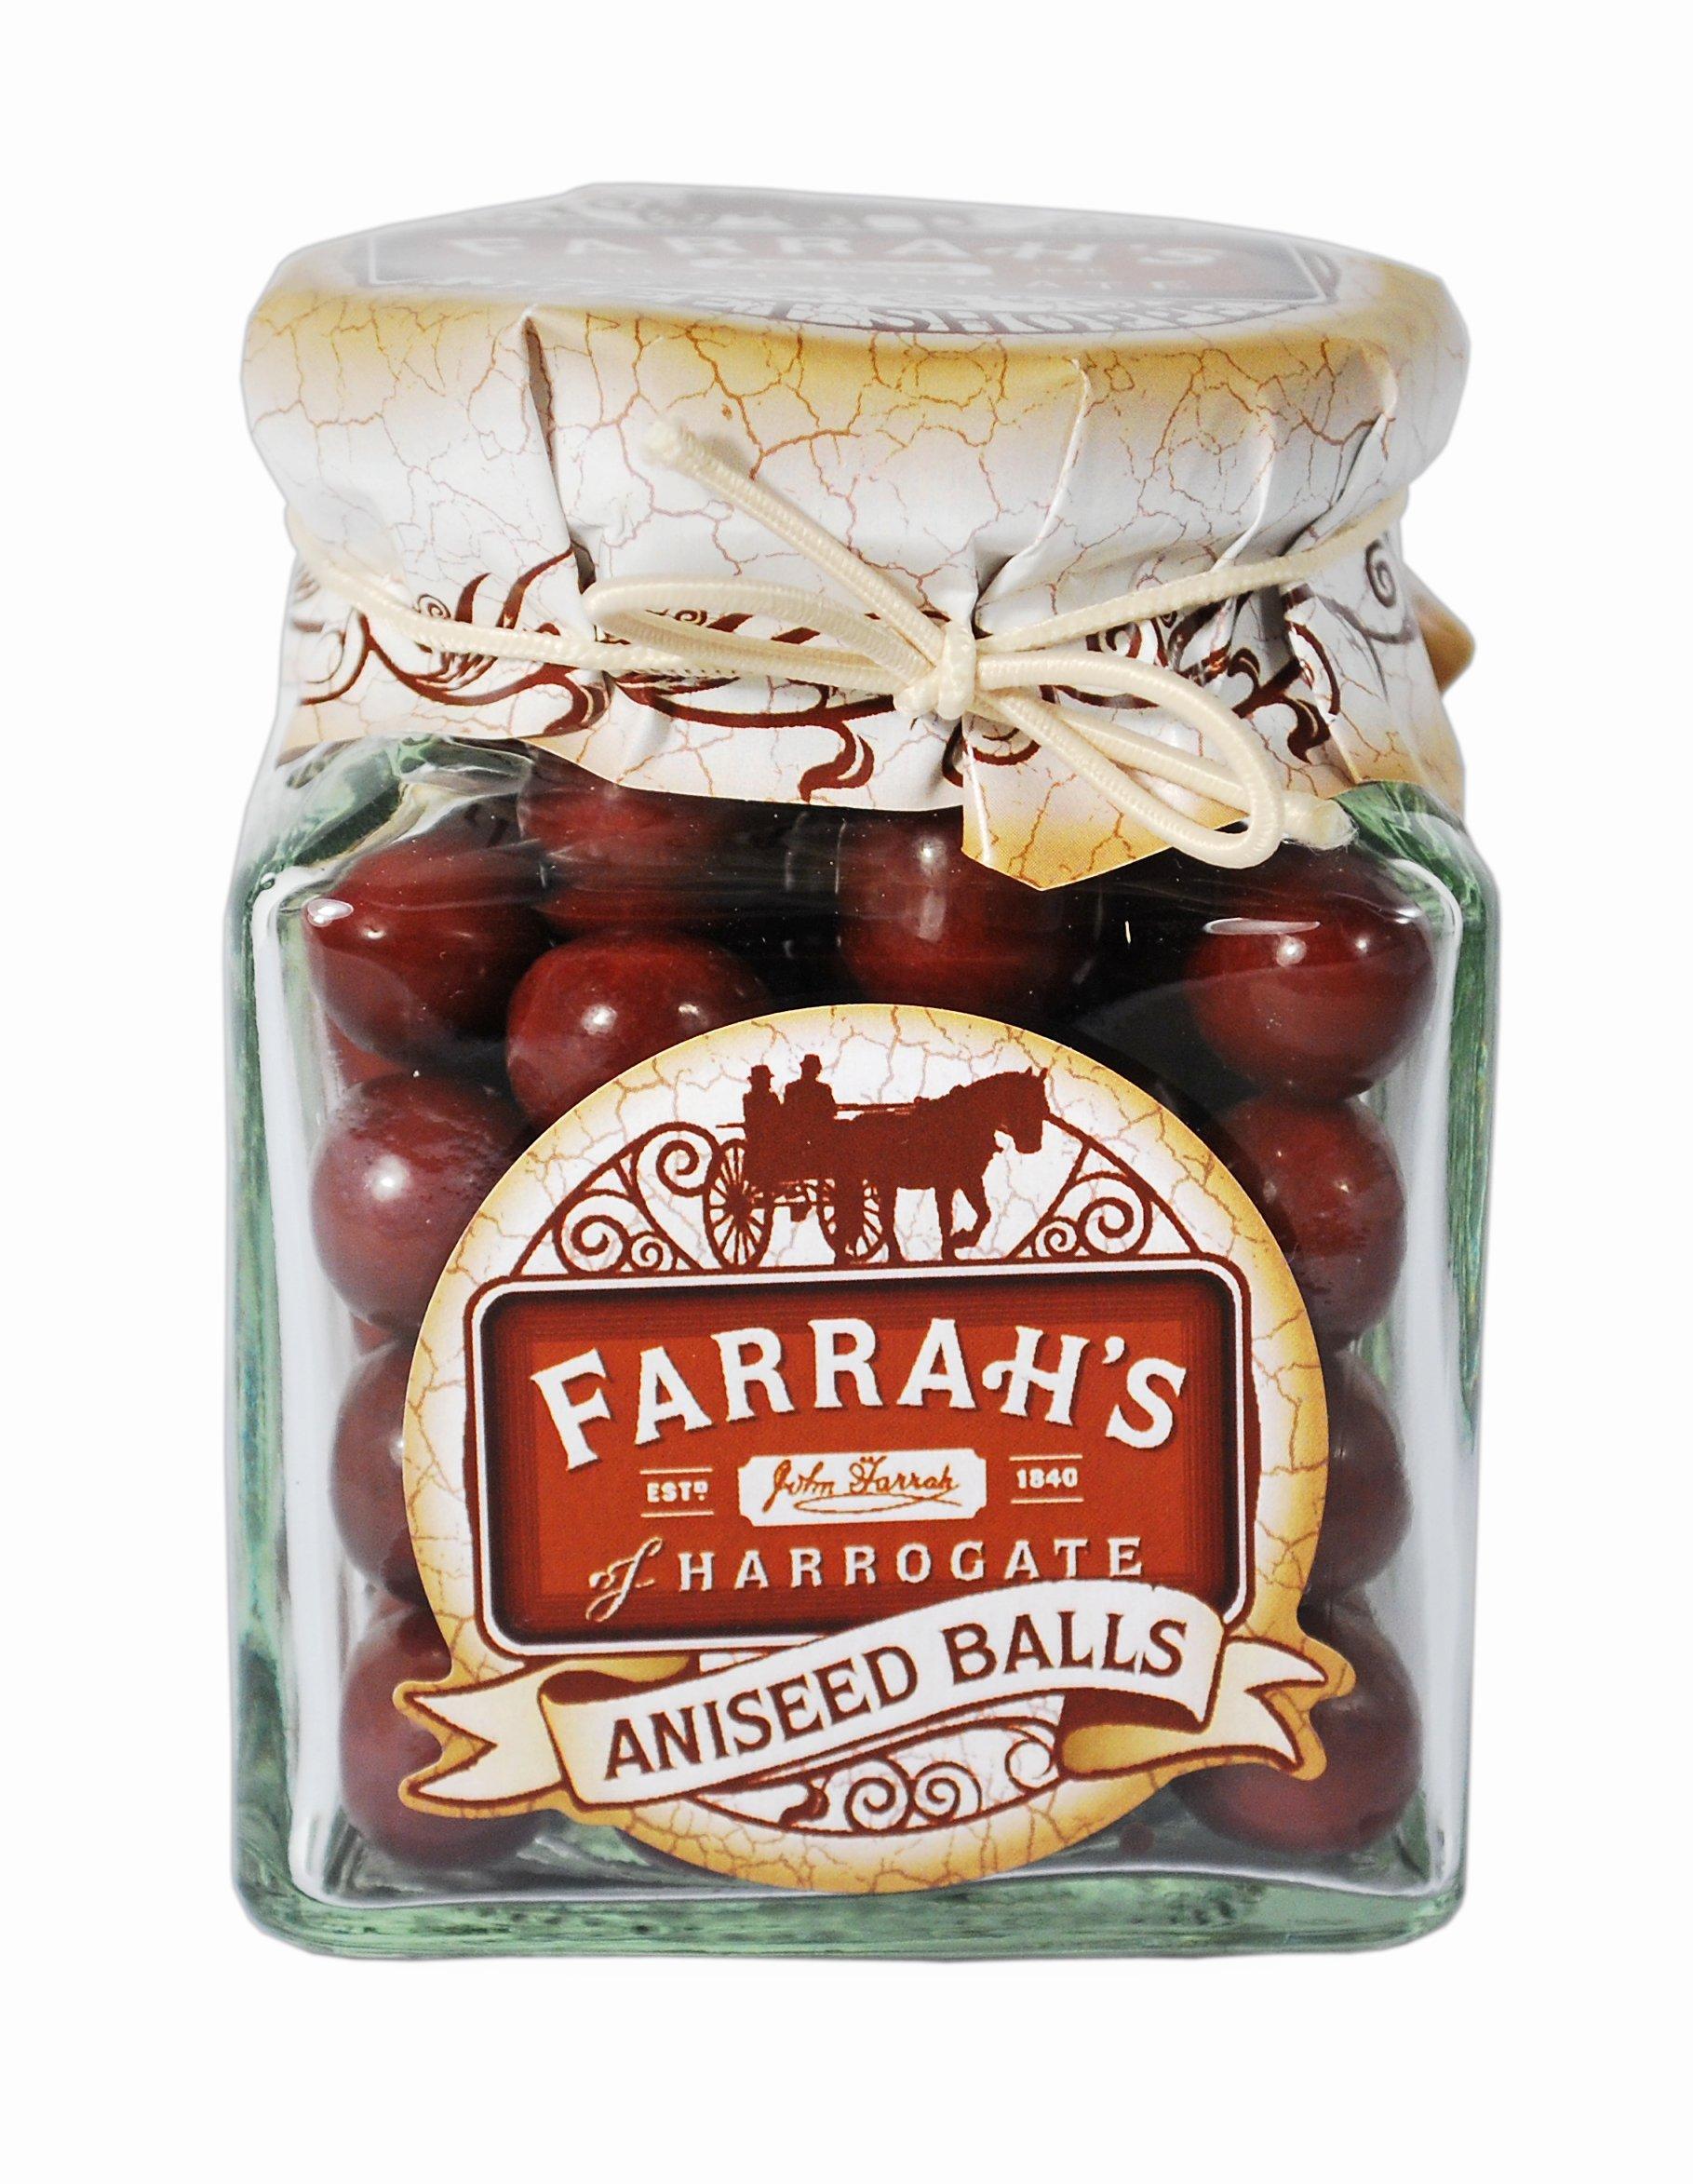 Farrah's of Harrogate Aniseed Balls Sweet Jar 160 g by Farrah's of Harrogate